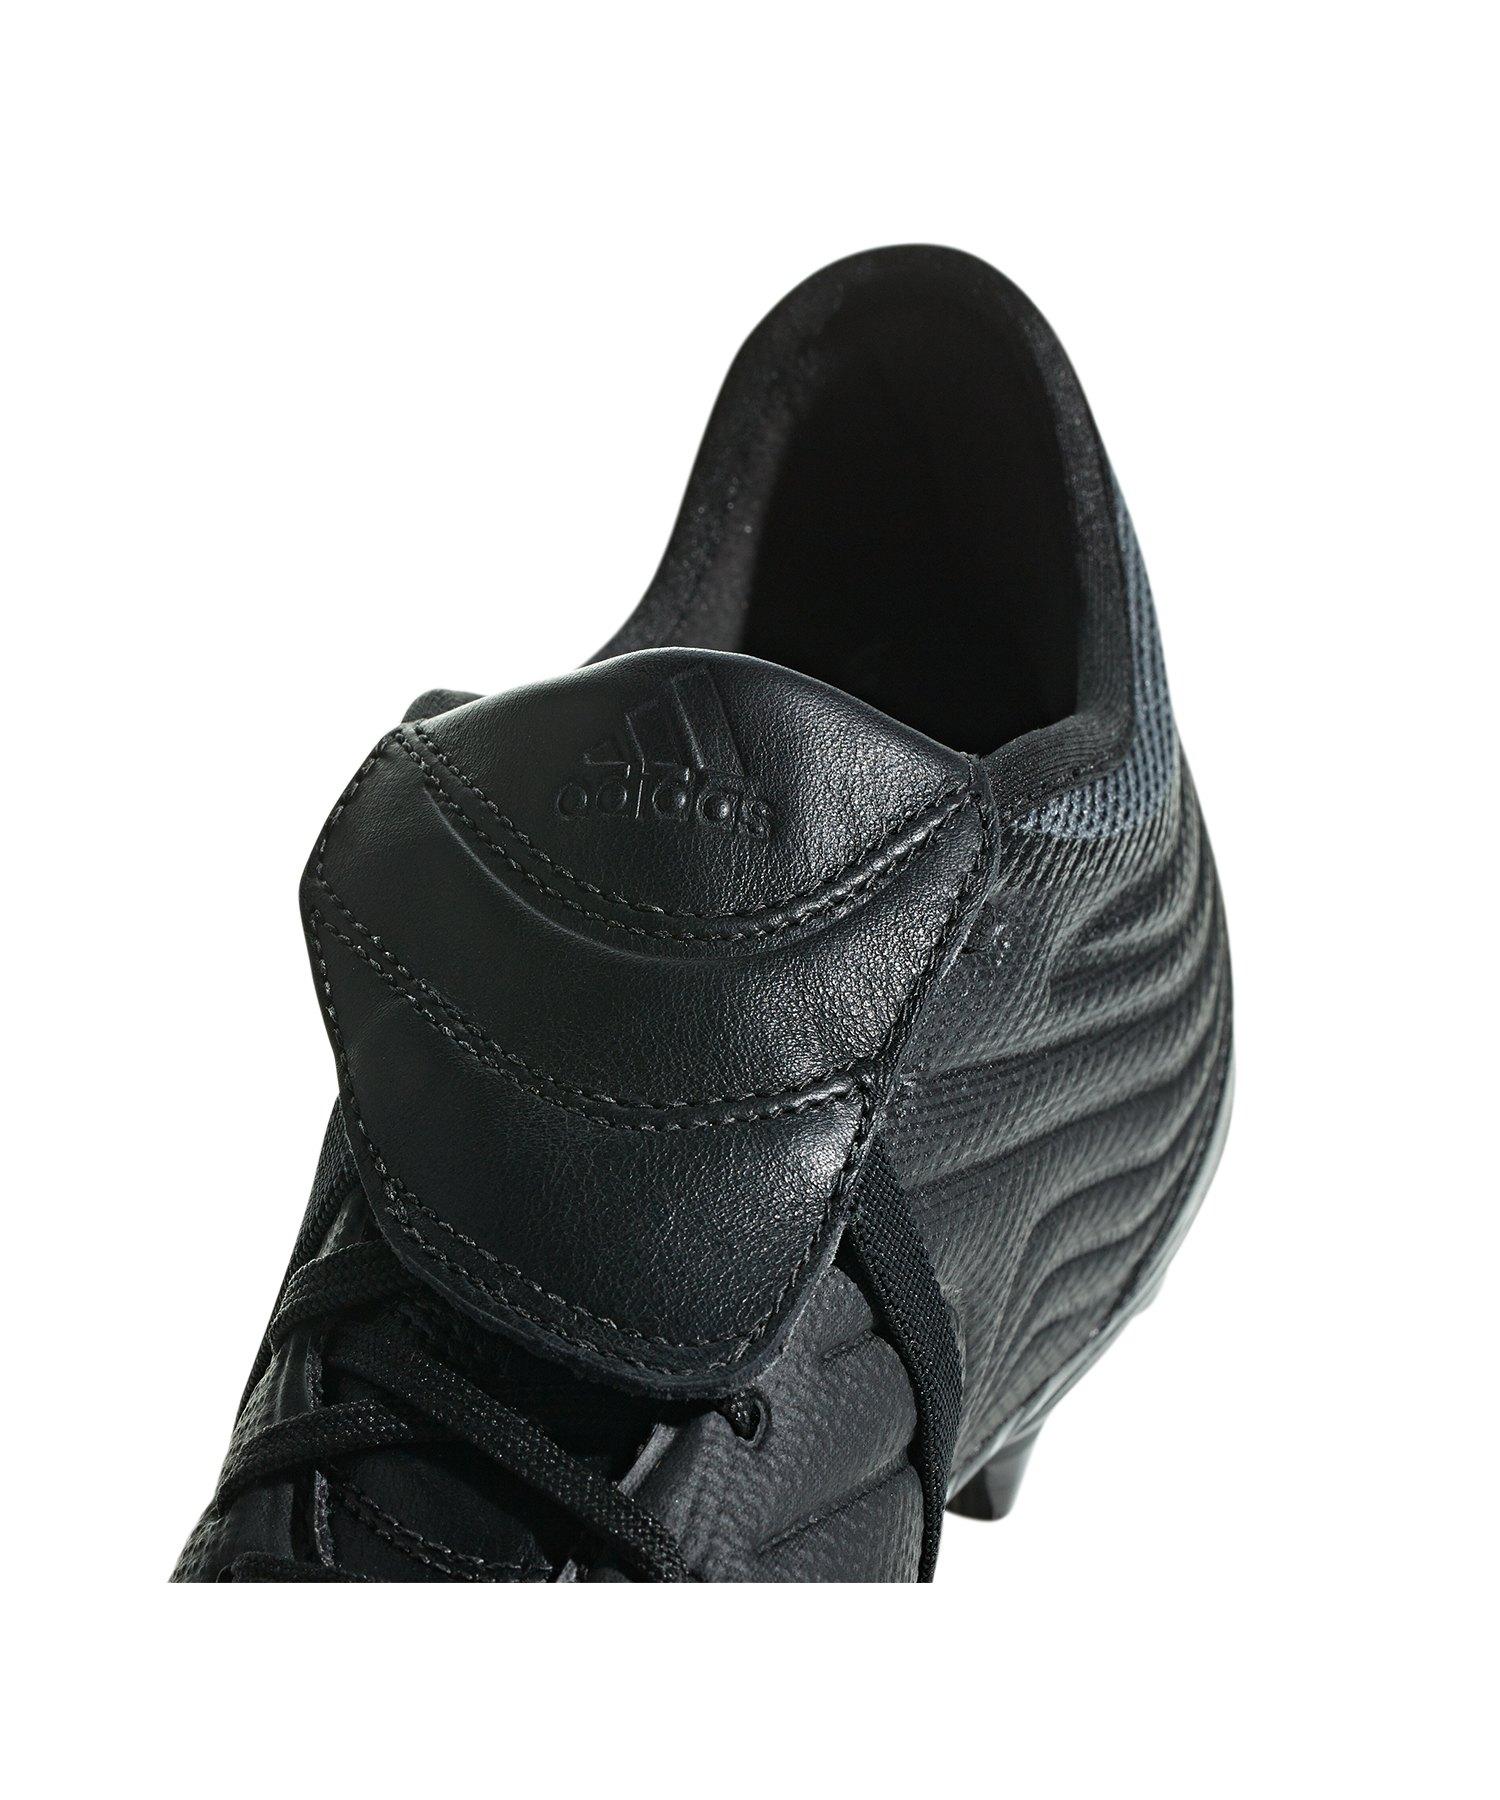 innovative design 227de 280b8 ... adidas COPA Gloro 19.2 FG Schwarz - schwarz ...